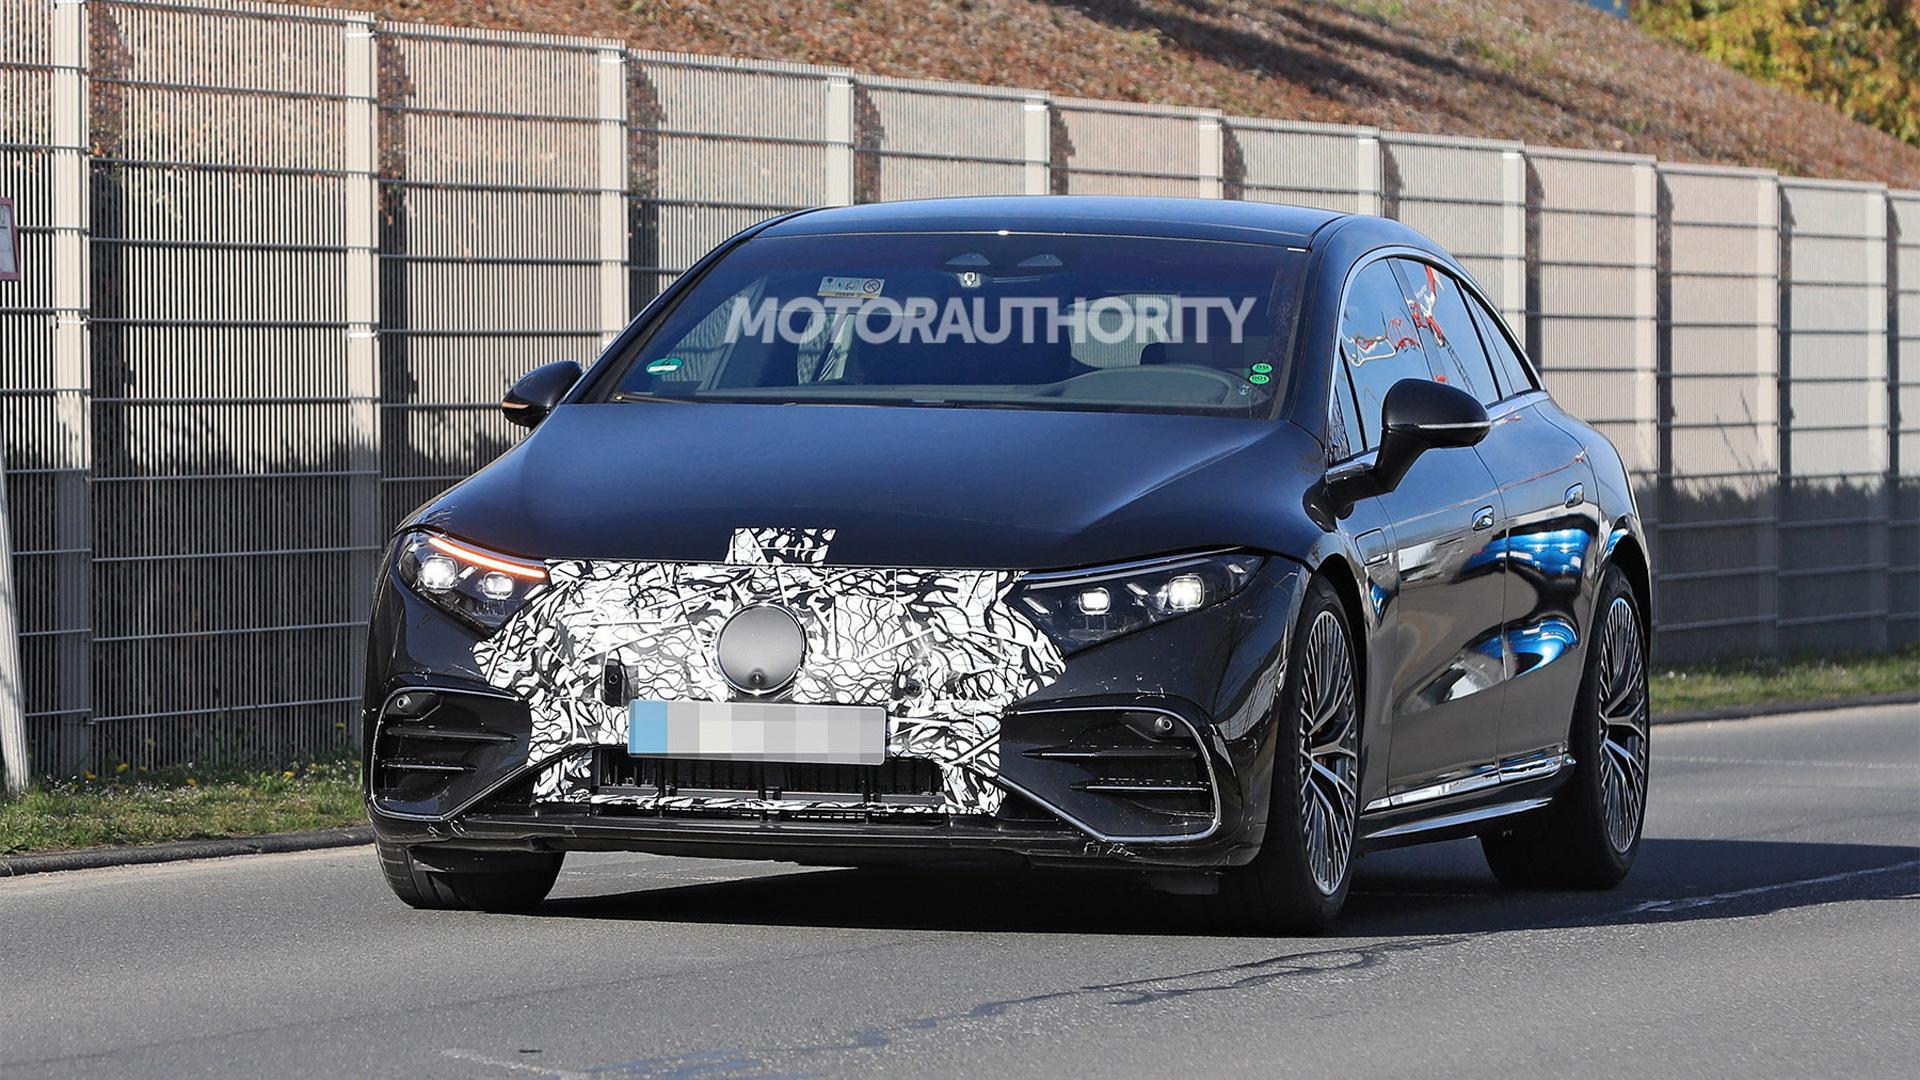 2022 Mercedes-Benz AMG EQS spy shots - Photo credit:S. Baldauf/SB-Medien